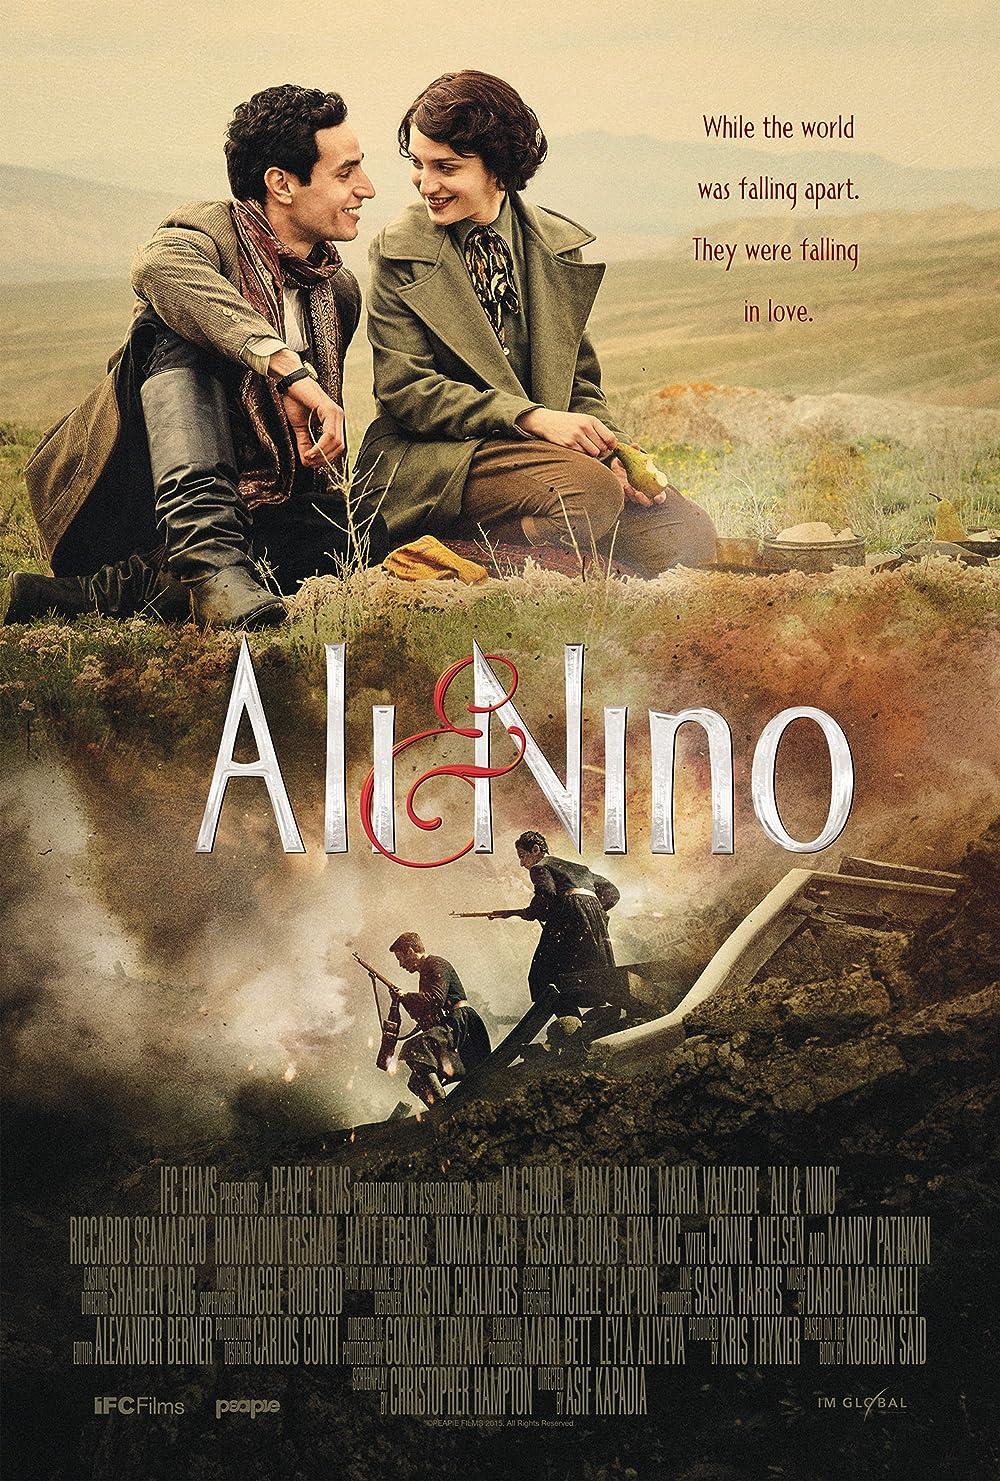 True ali and story nino Ali and